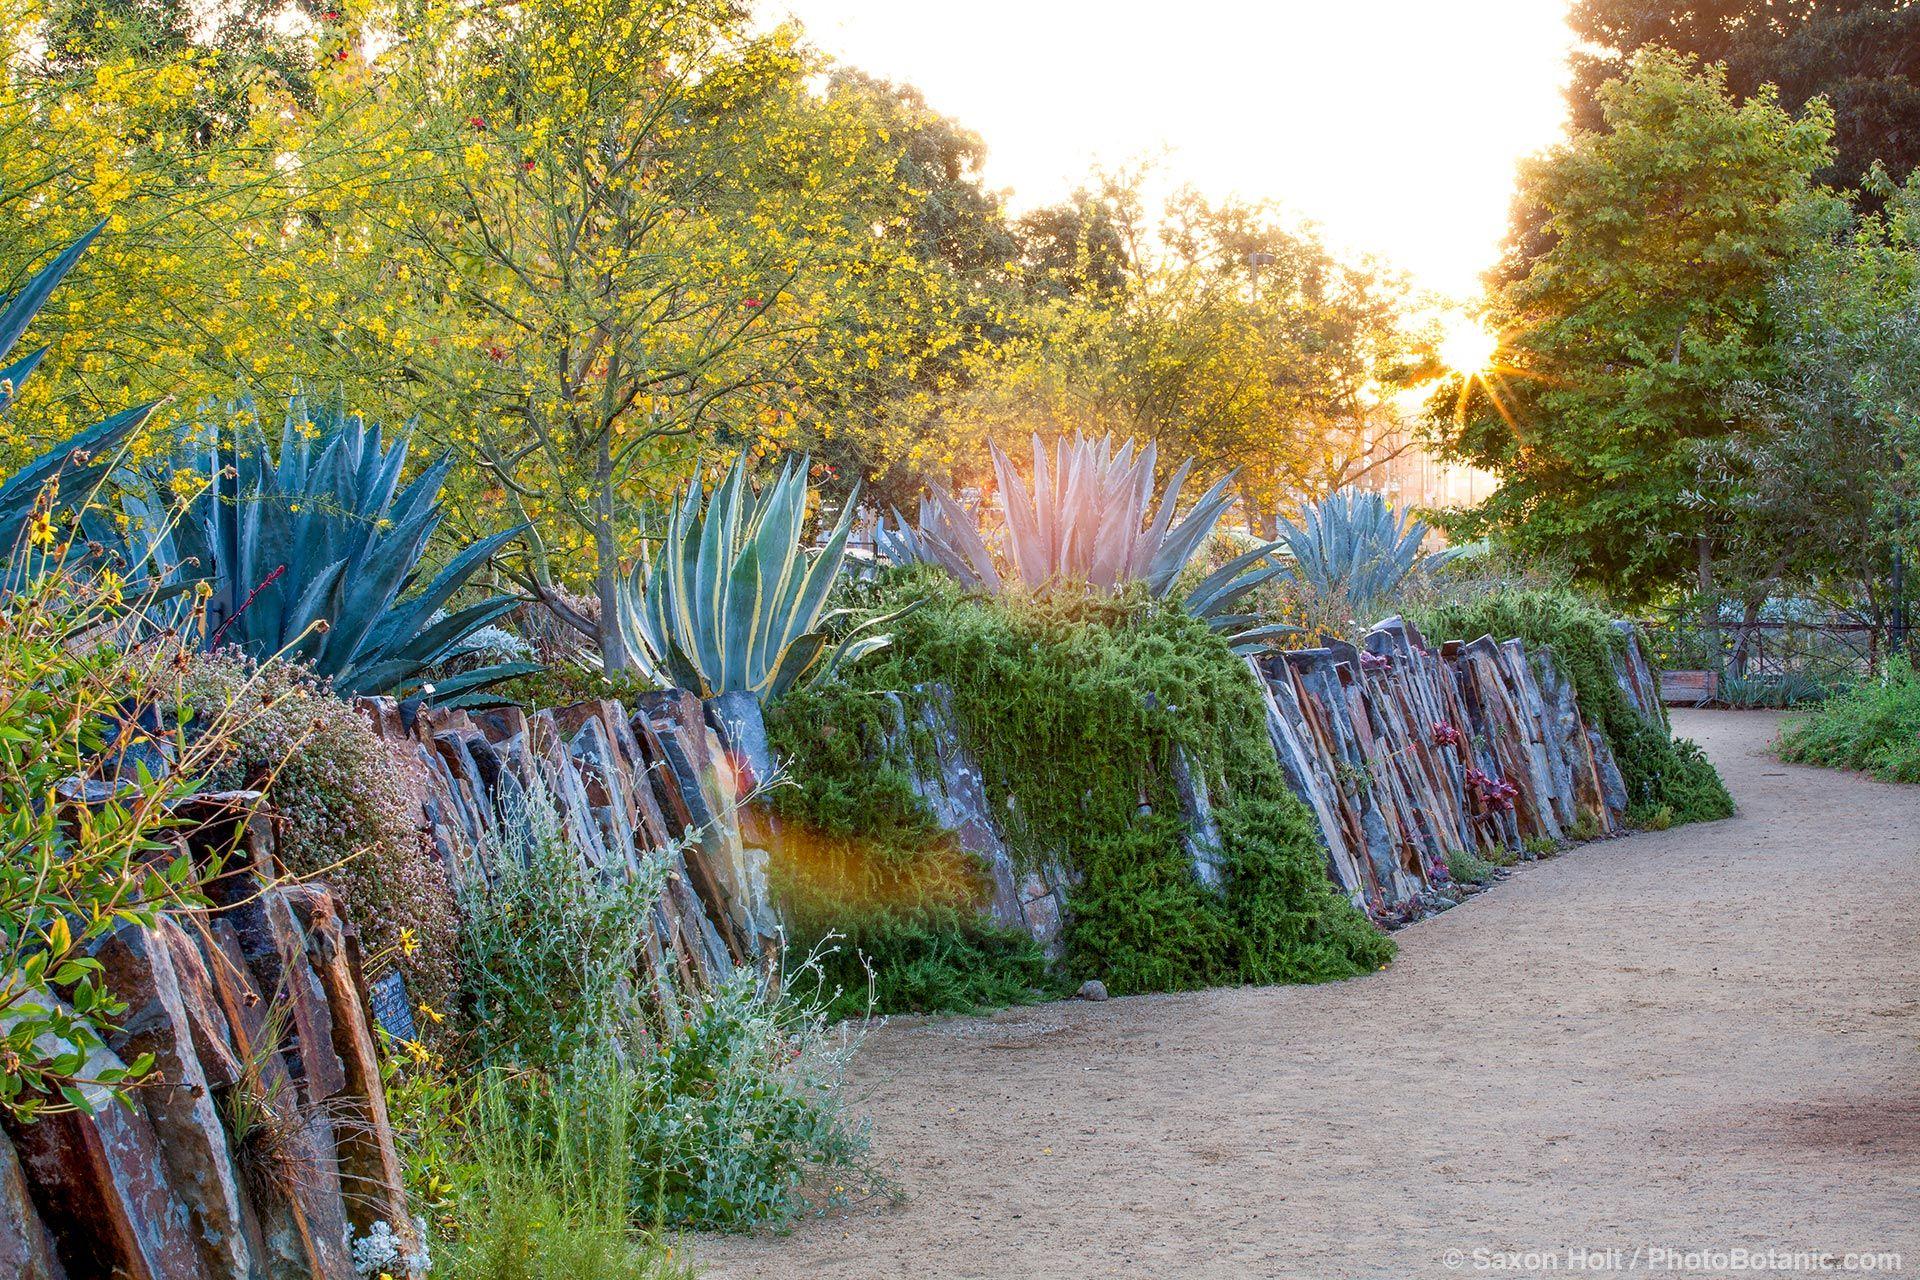 Holt 1129 109 1920c Jpg 1920 1280 Garden Design Landscaping Inspiration Garden Design Magazine